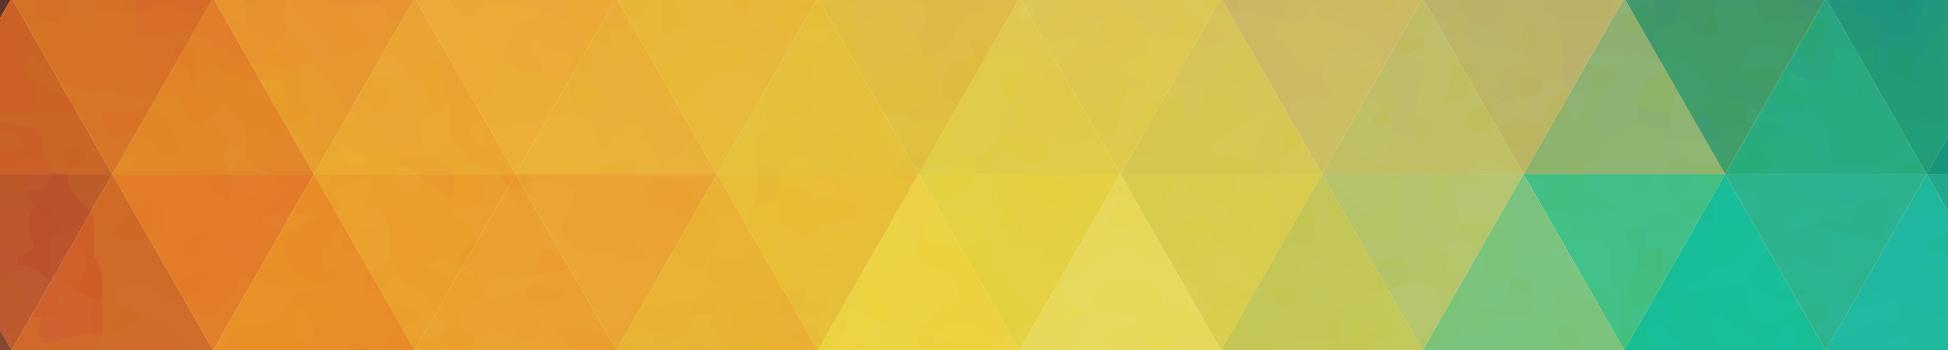 bn-homepage-conceitos-frase-3-01B